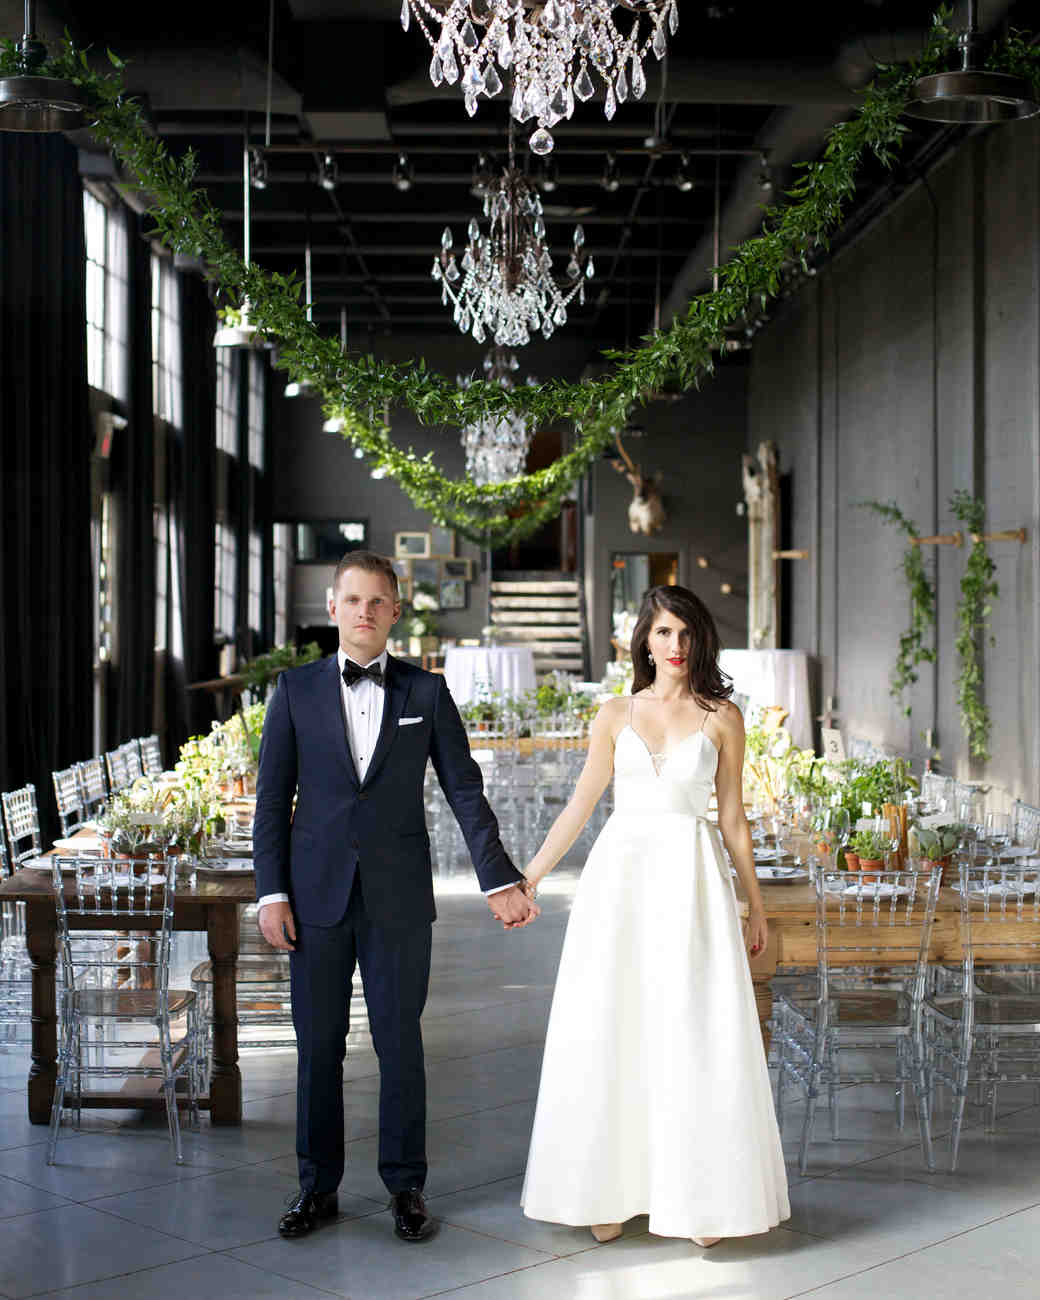 a49d99053 A Whimsical Warehouse Wedding in Calgary